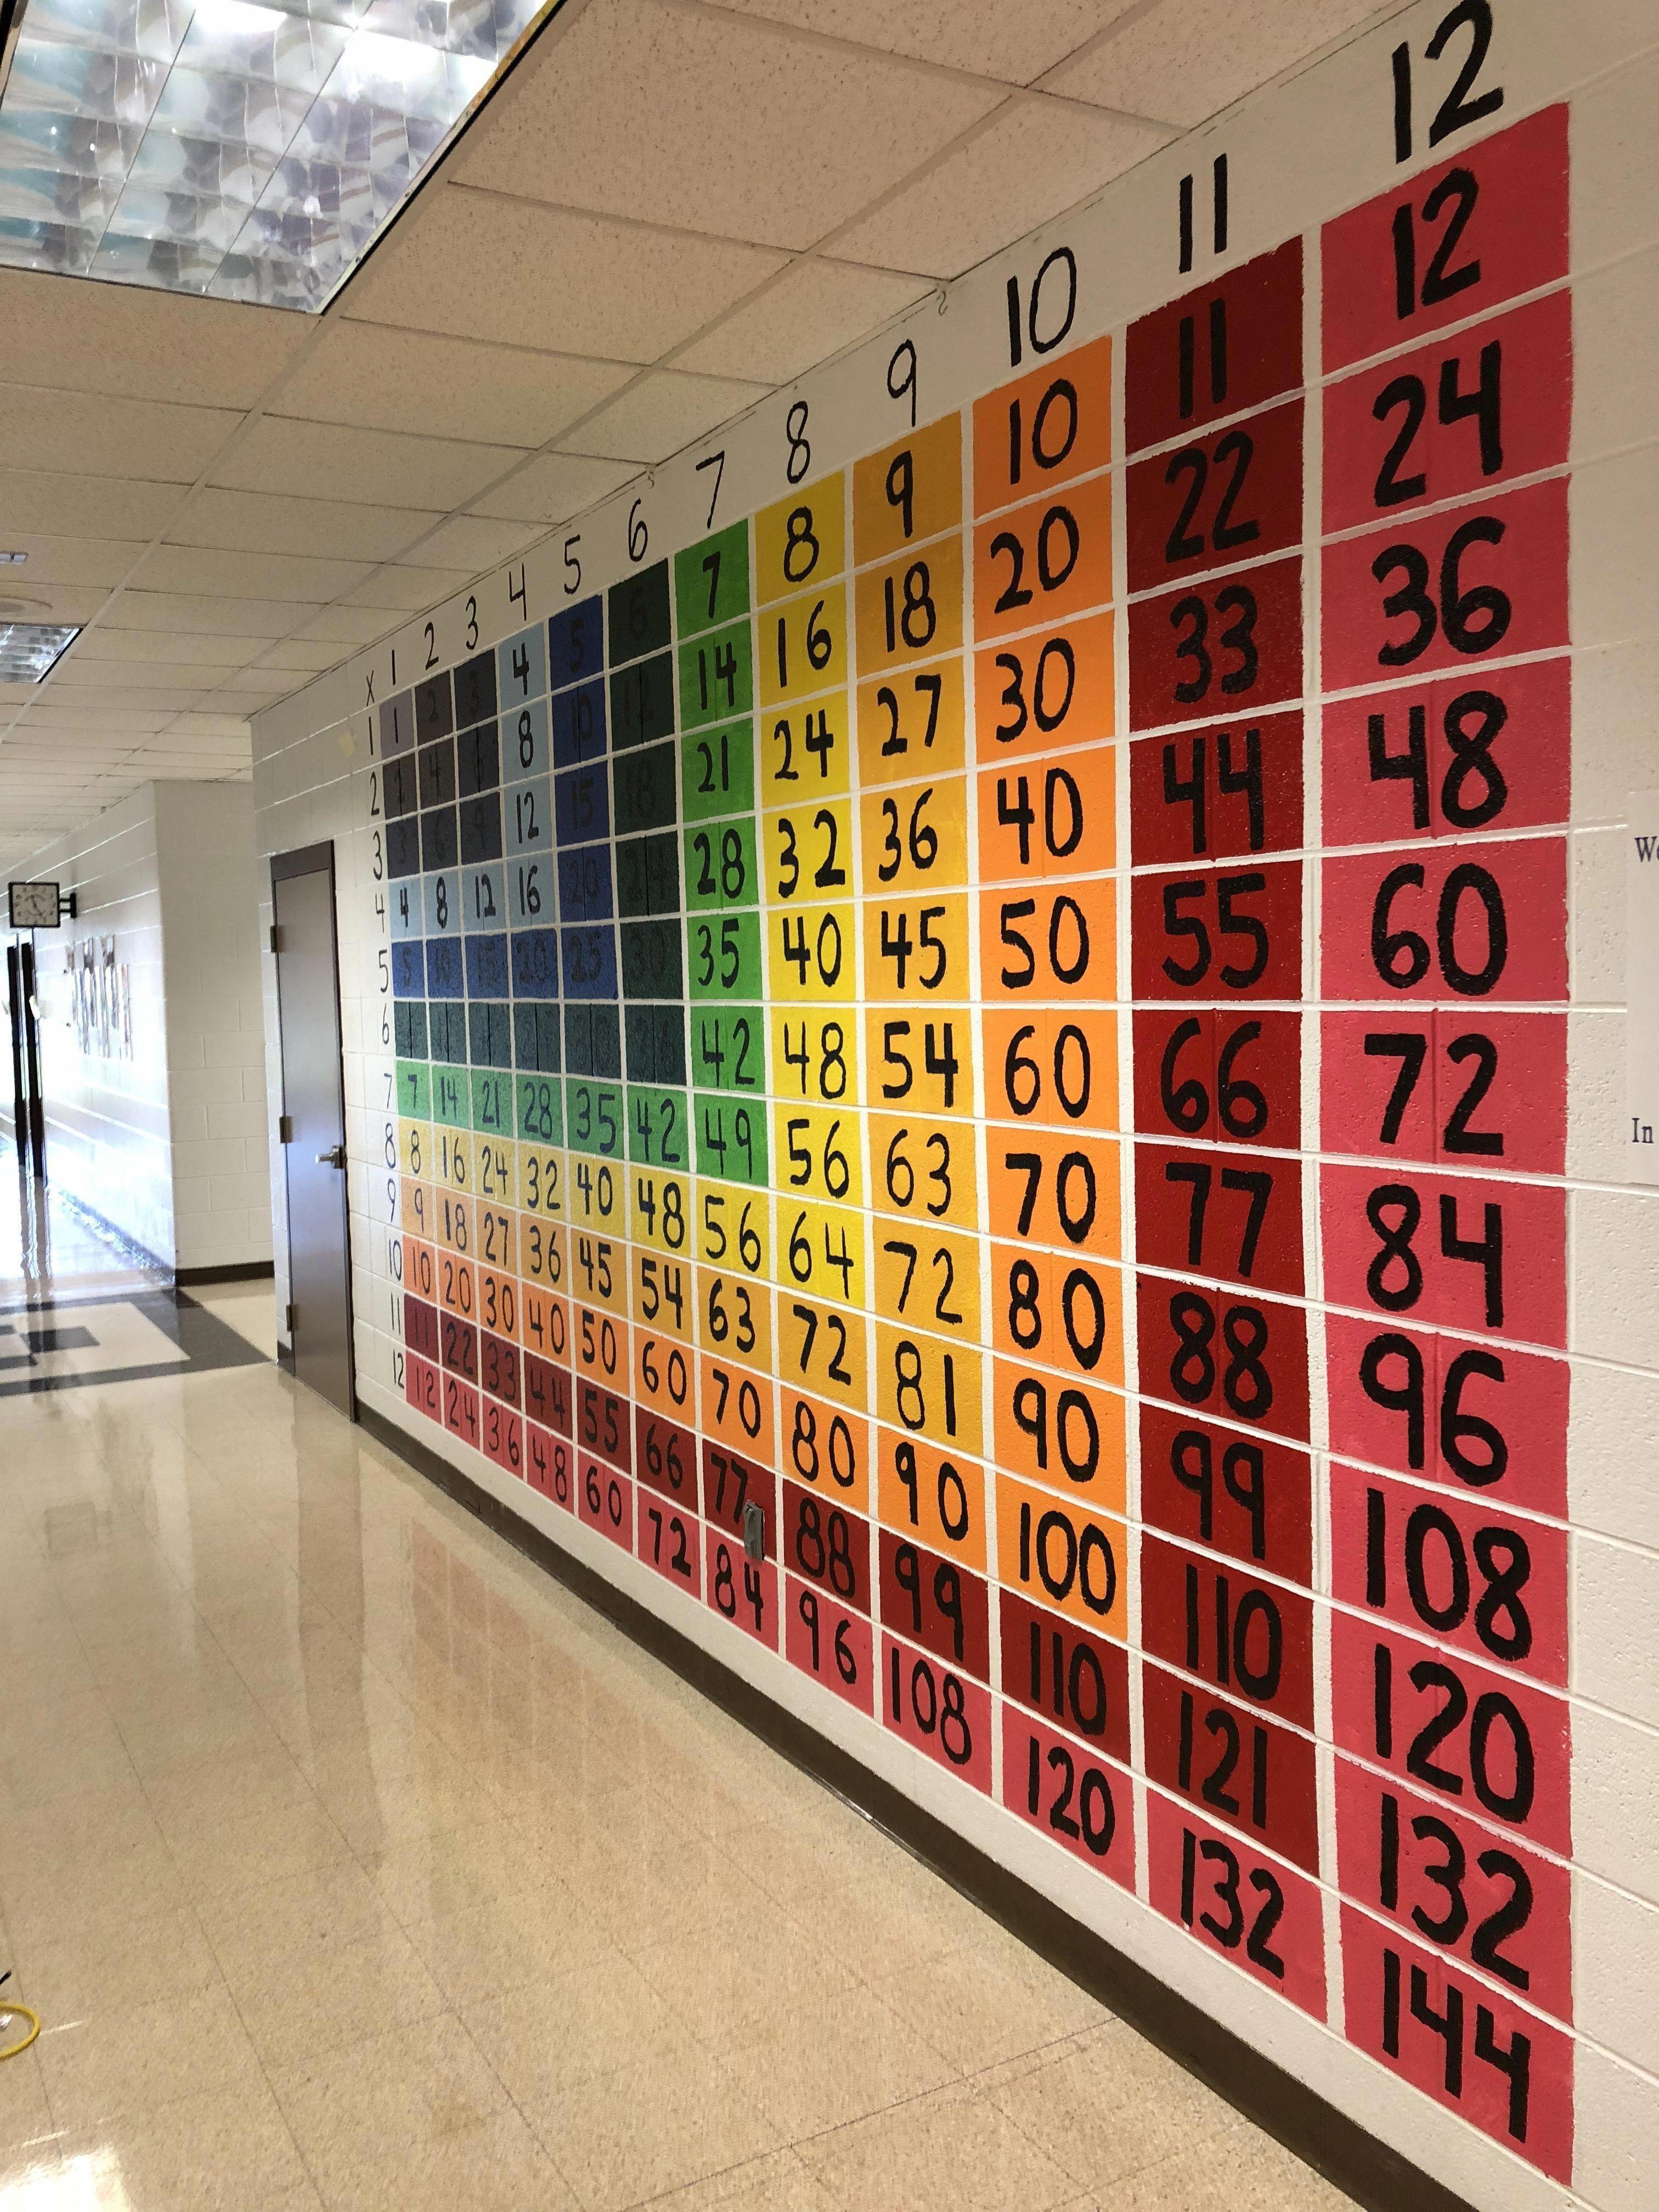 Completed Multiplication Chart In 5th Grade Hallway Hallwayideas Hallwaydecorations School Hallway Decorati School Murals School Hallways Multiplication Chart